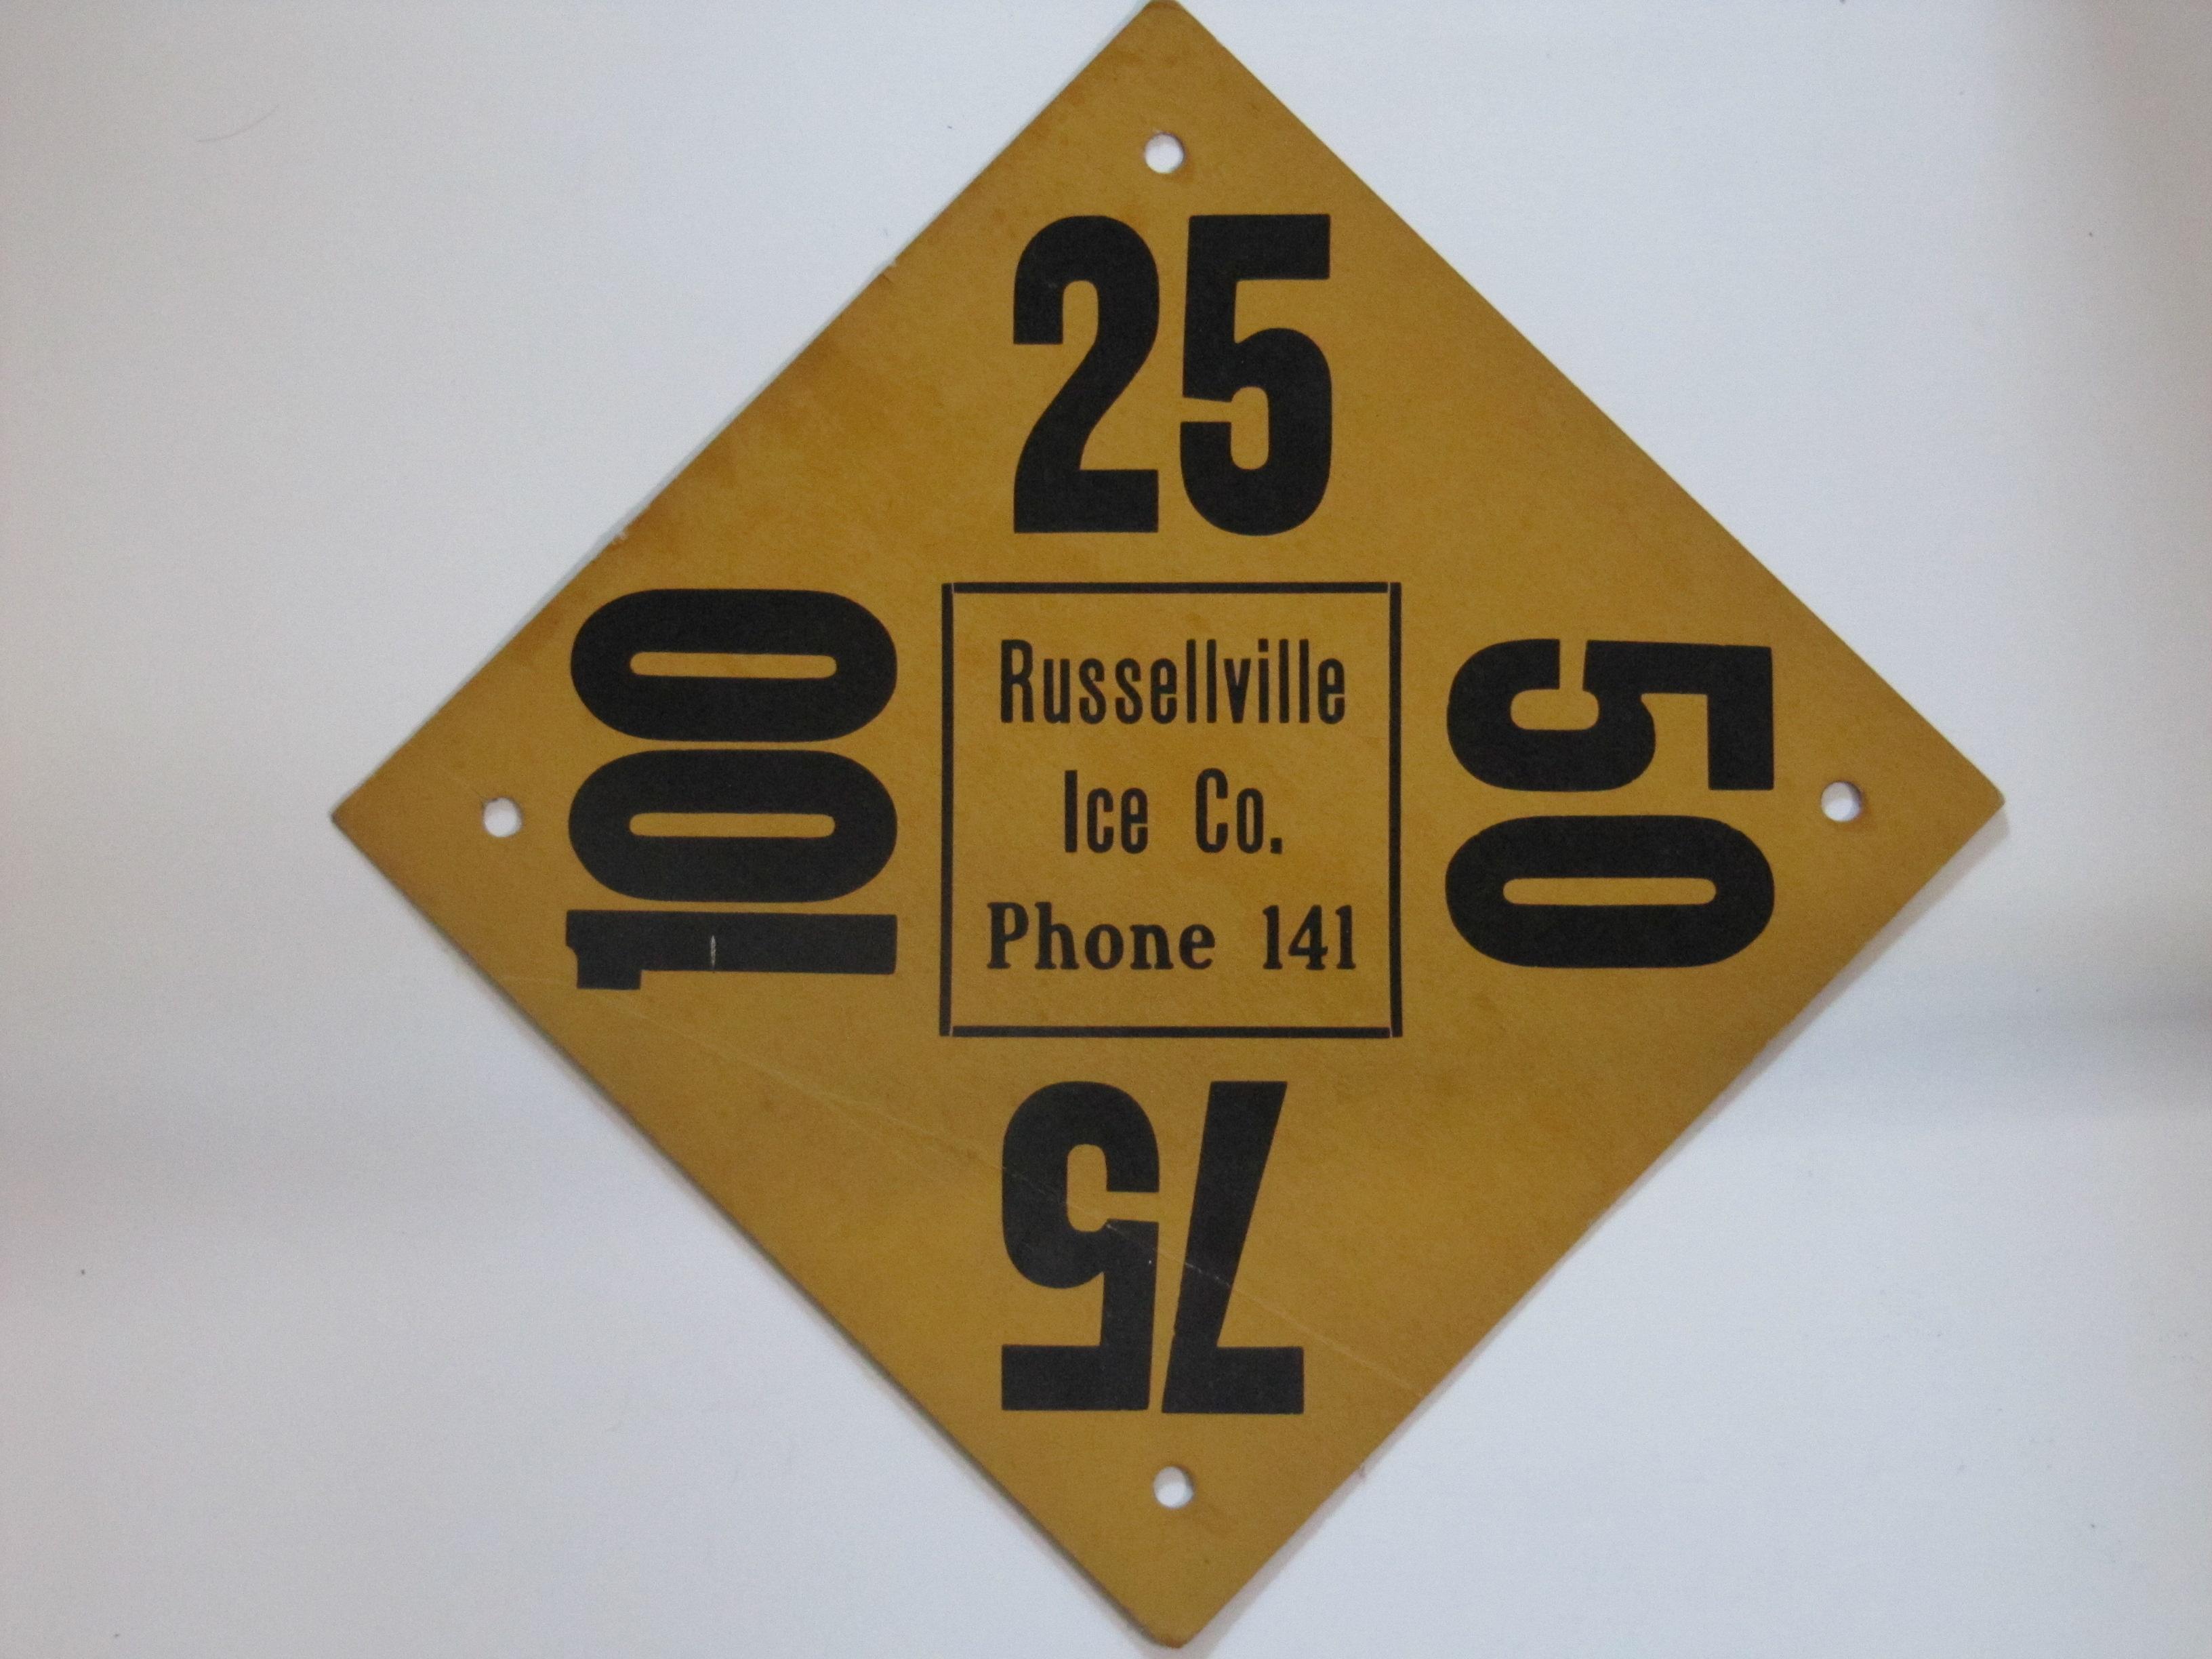 Russellville Ice Co.